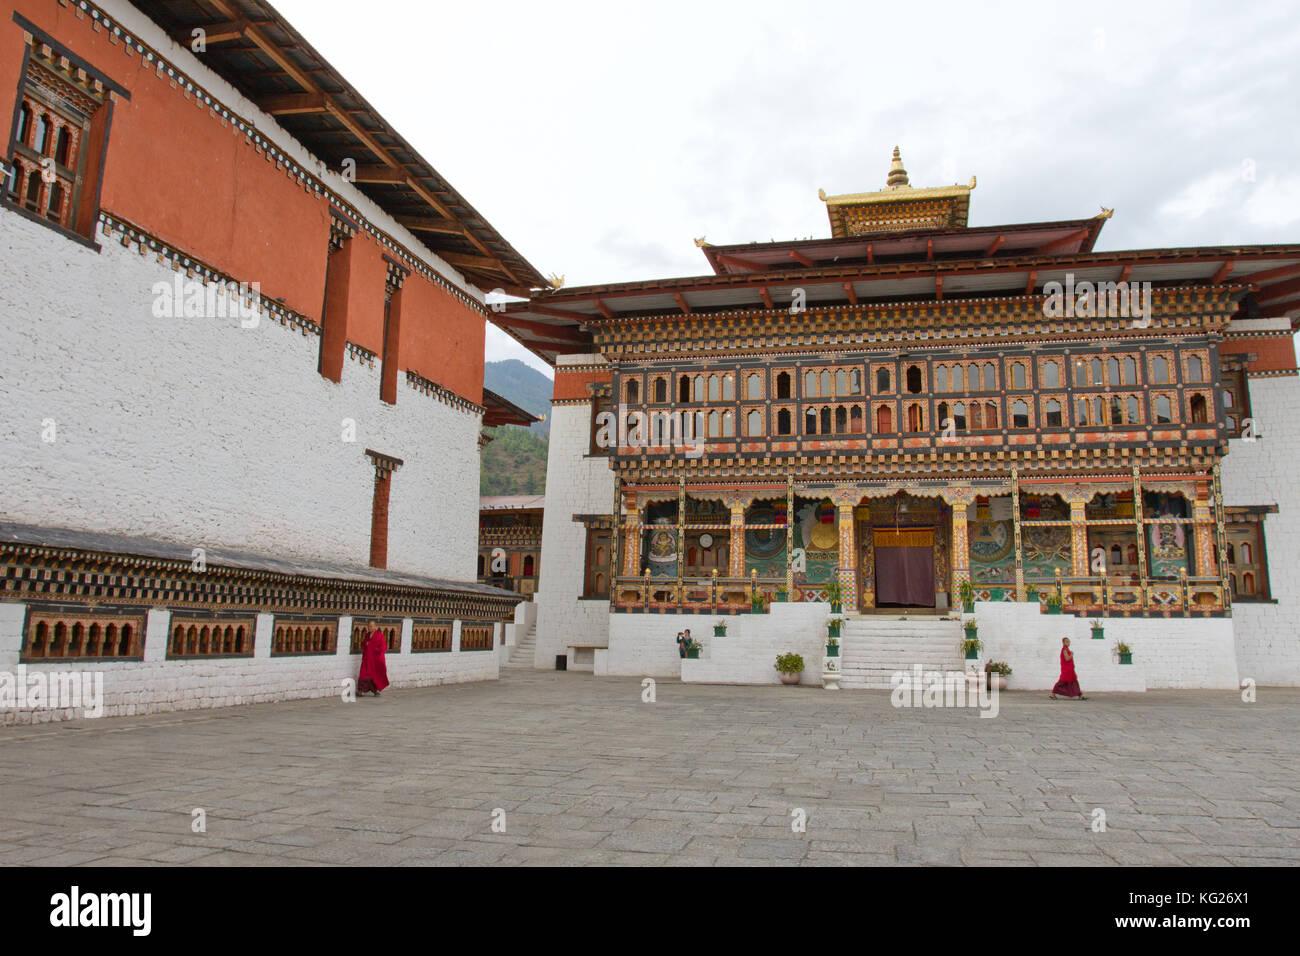 La Tashi chho fortezza e i monaci buddisti, thimphu, Bhutan, asia Immagini Stock